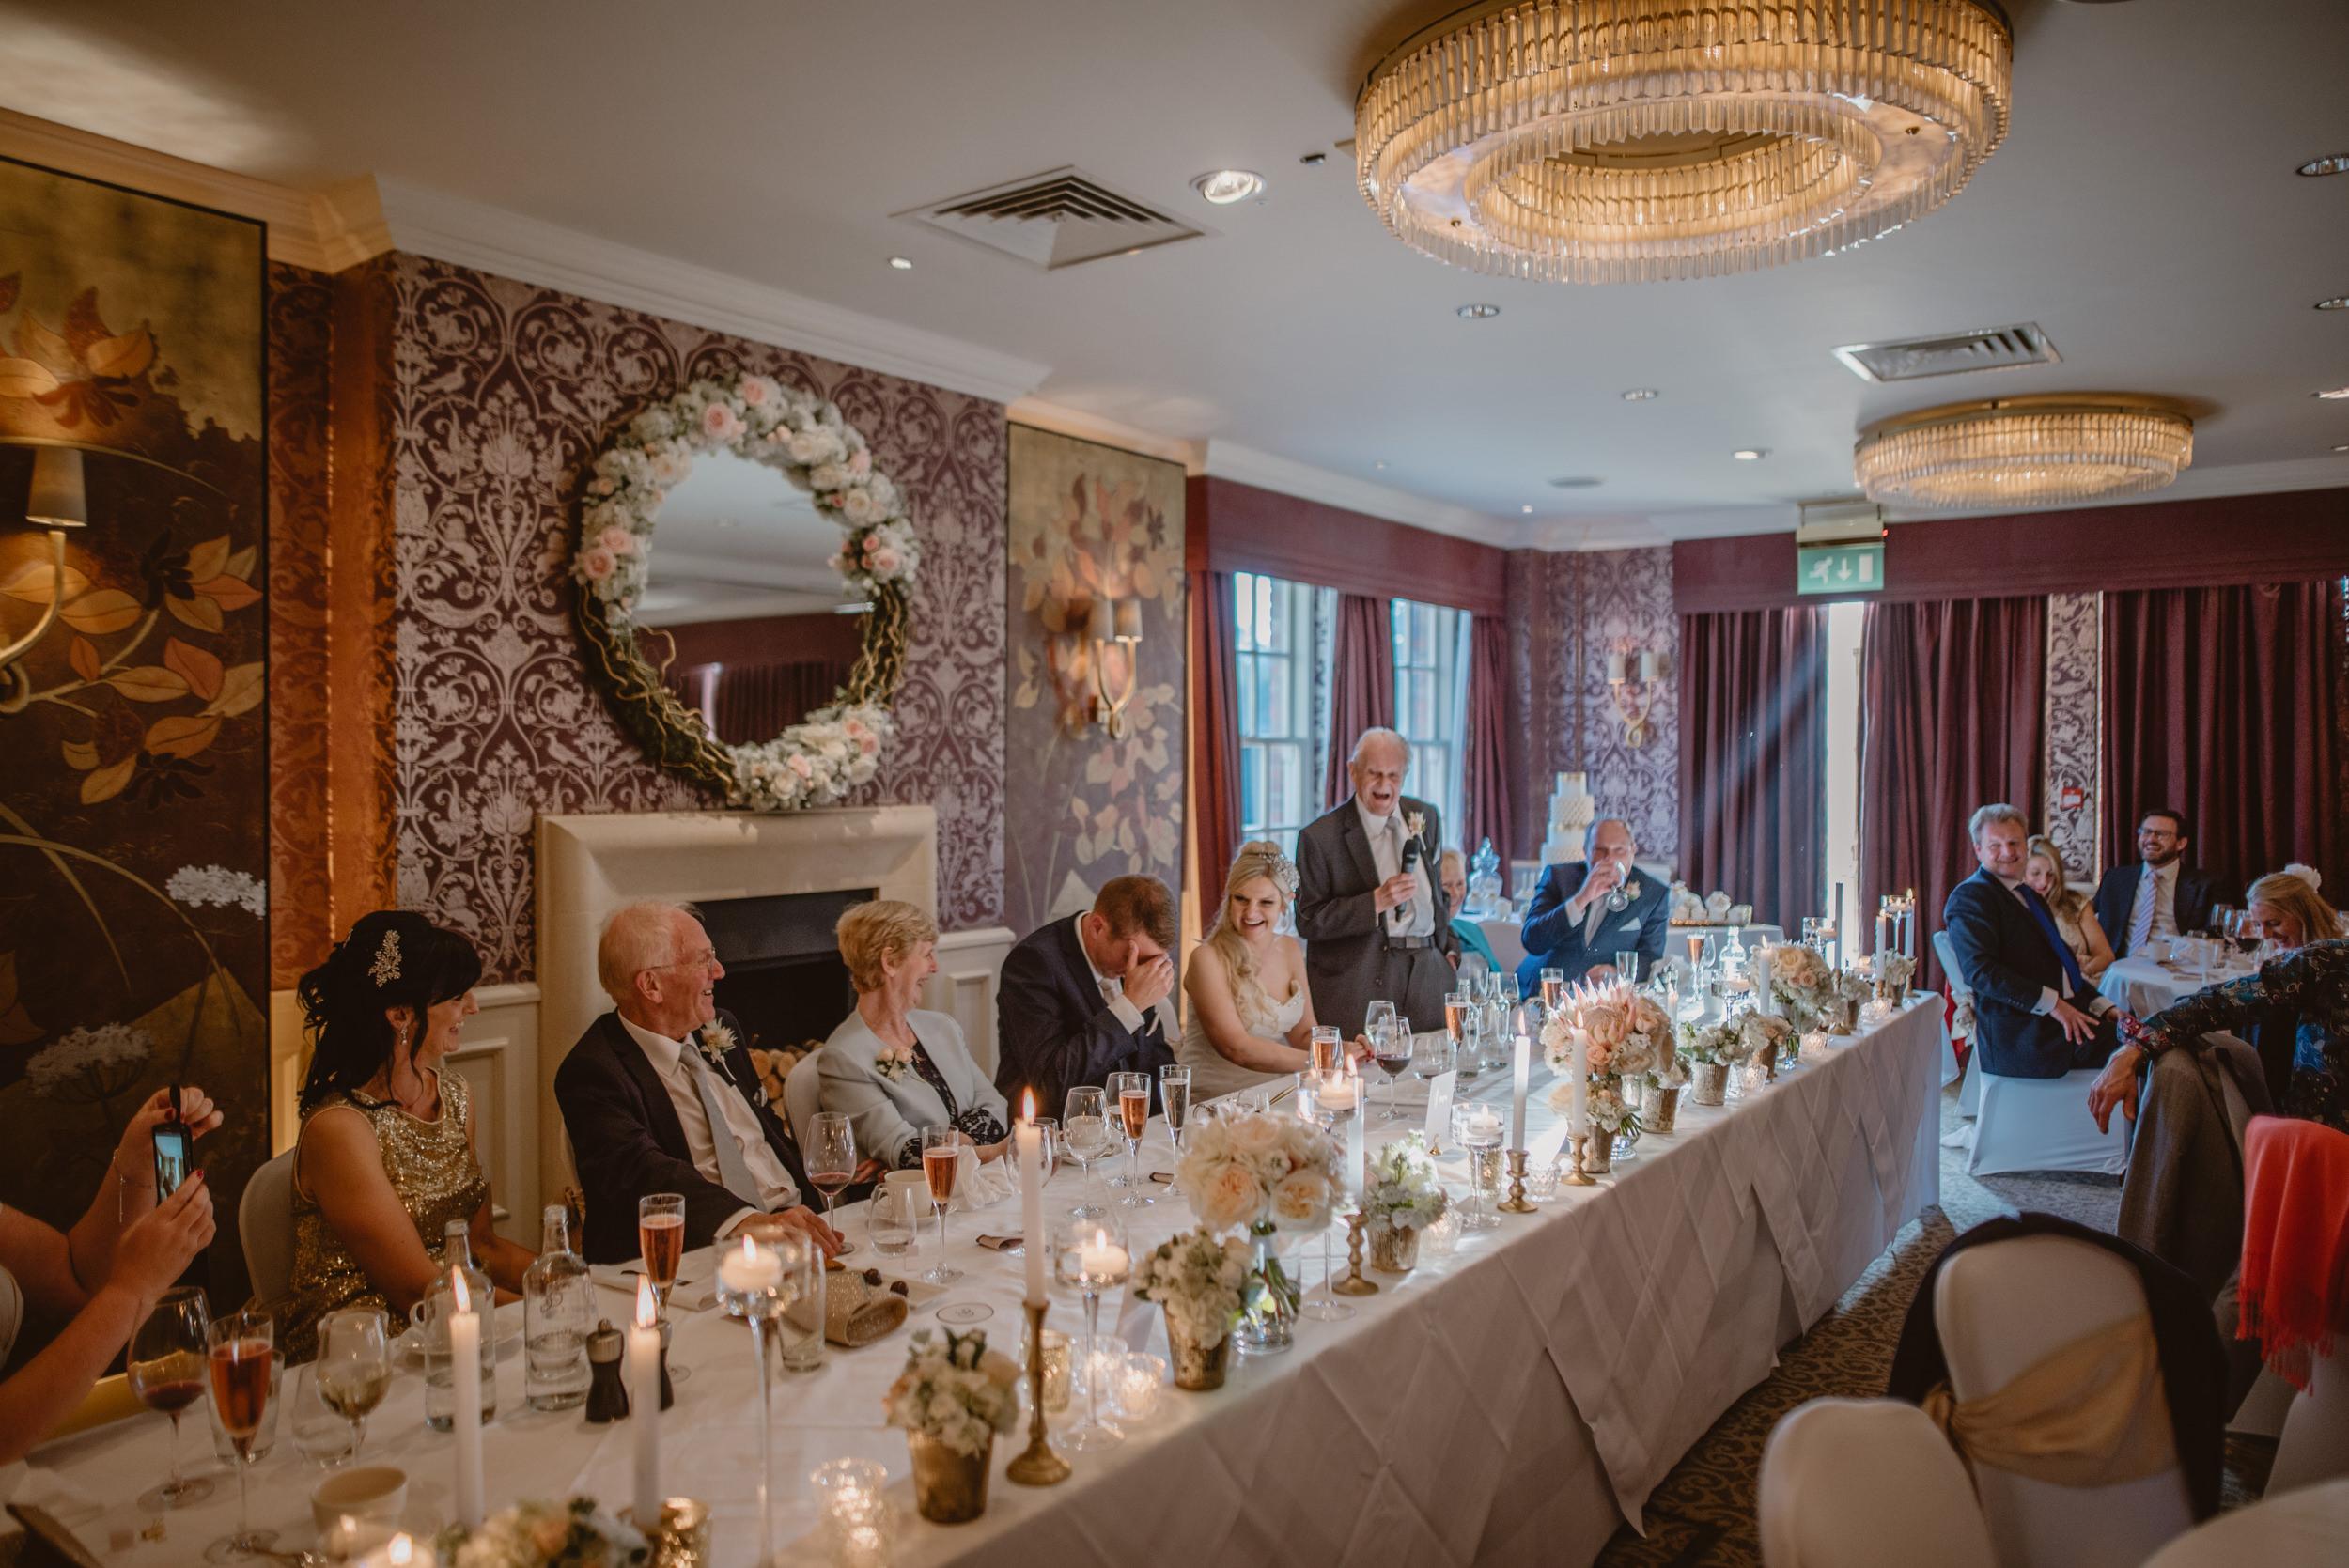 Trisha-and-Roger-wedding-The-Priory-Church-and-Chewton-Glen-Hotel-Christchurch-Manu-Mendoza-Wedding-Photography-391.jpg